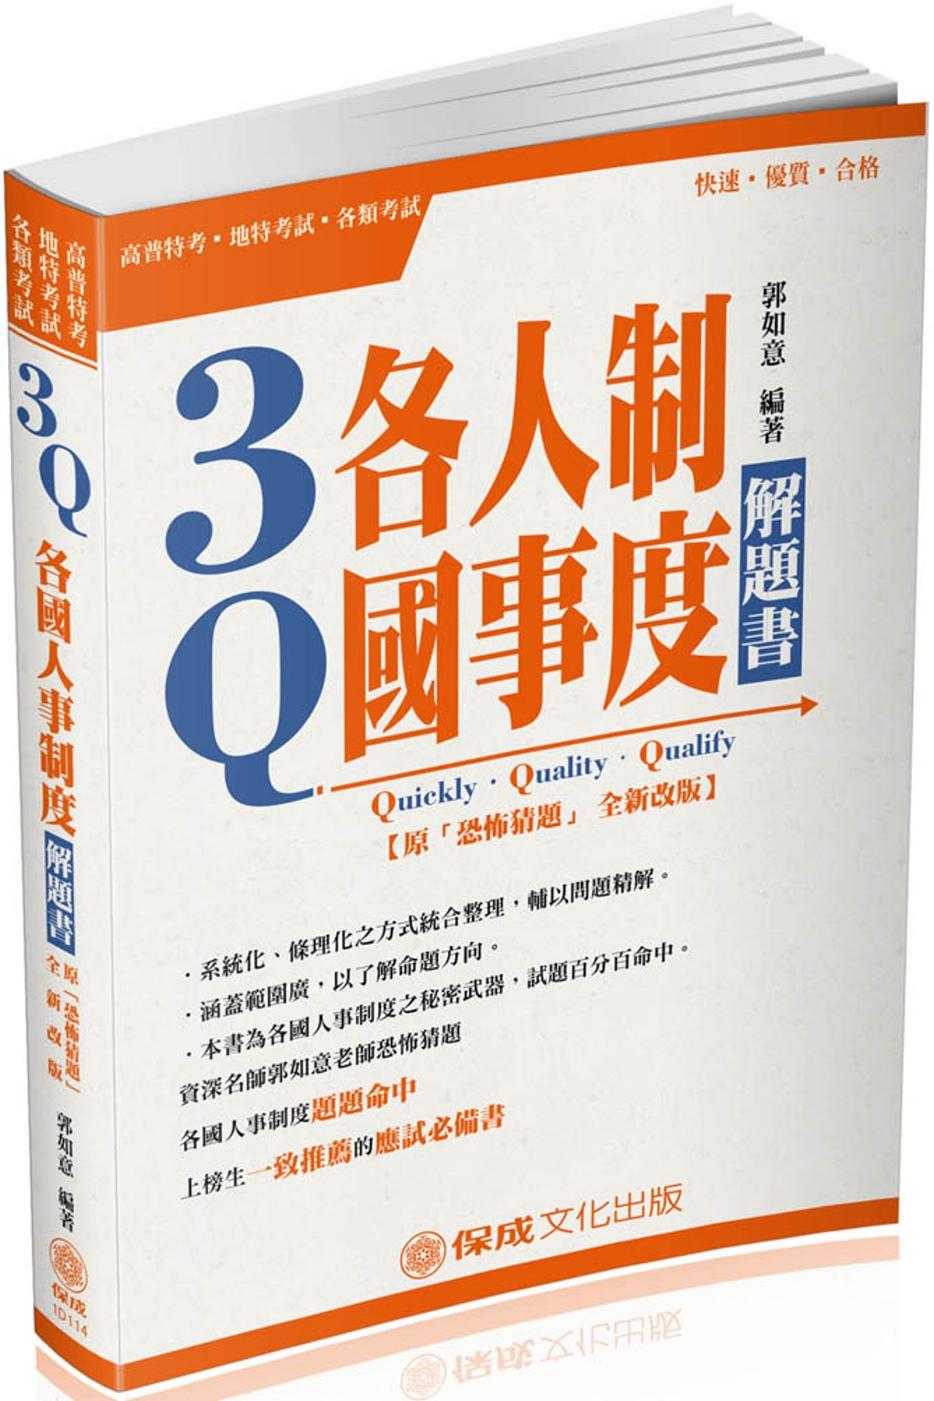 3Q各國人事制度-解題書(原:恐怖猜題)-2018高普特考<保成>(十一版)